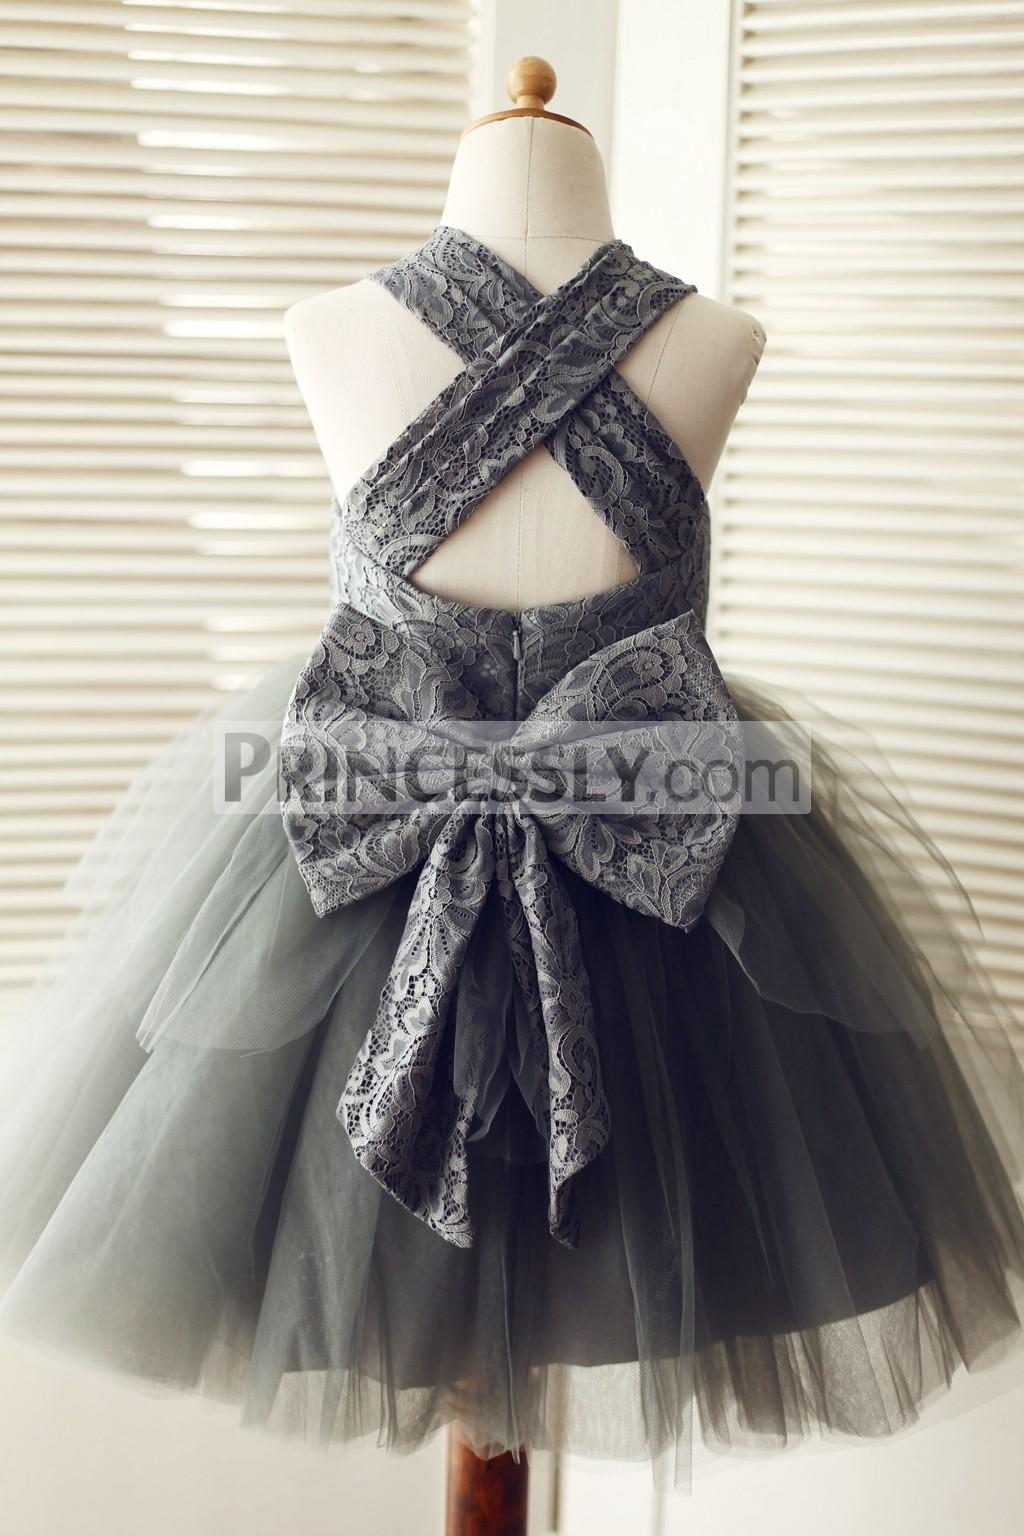 Cross Back Wedding Baby Girl Dress with Big Bow